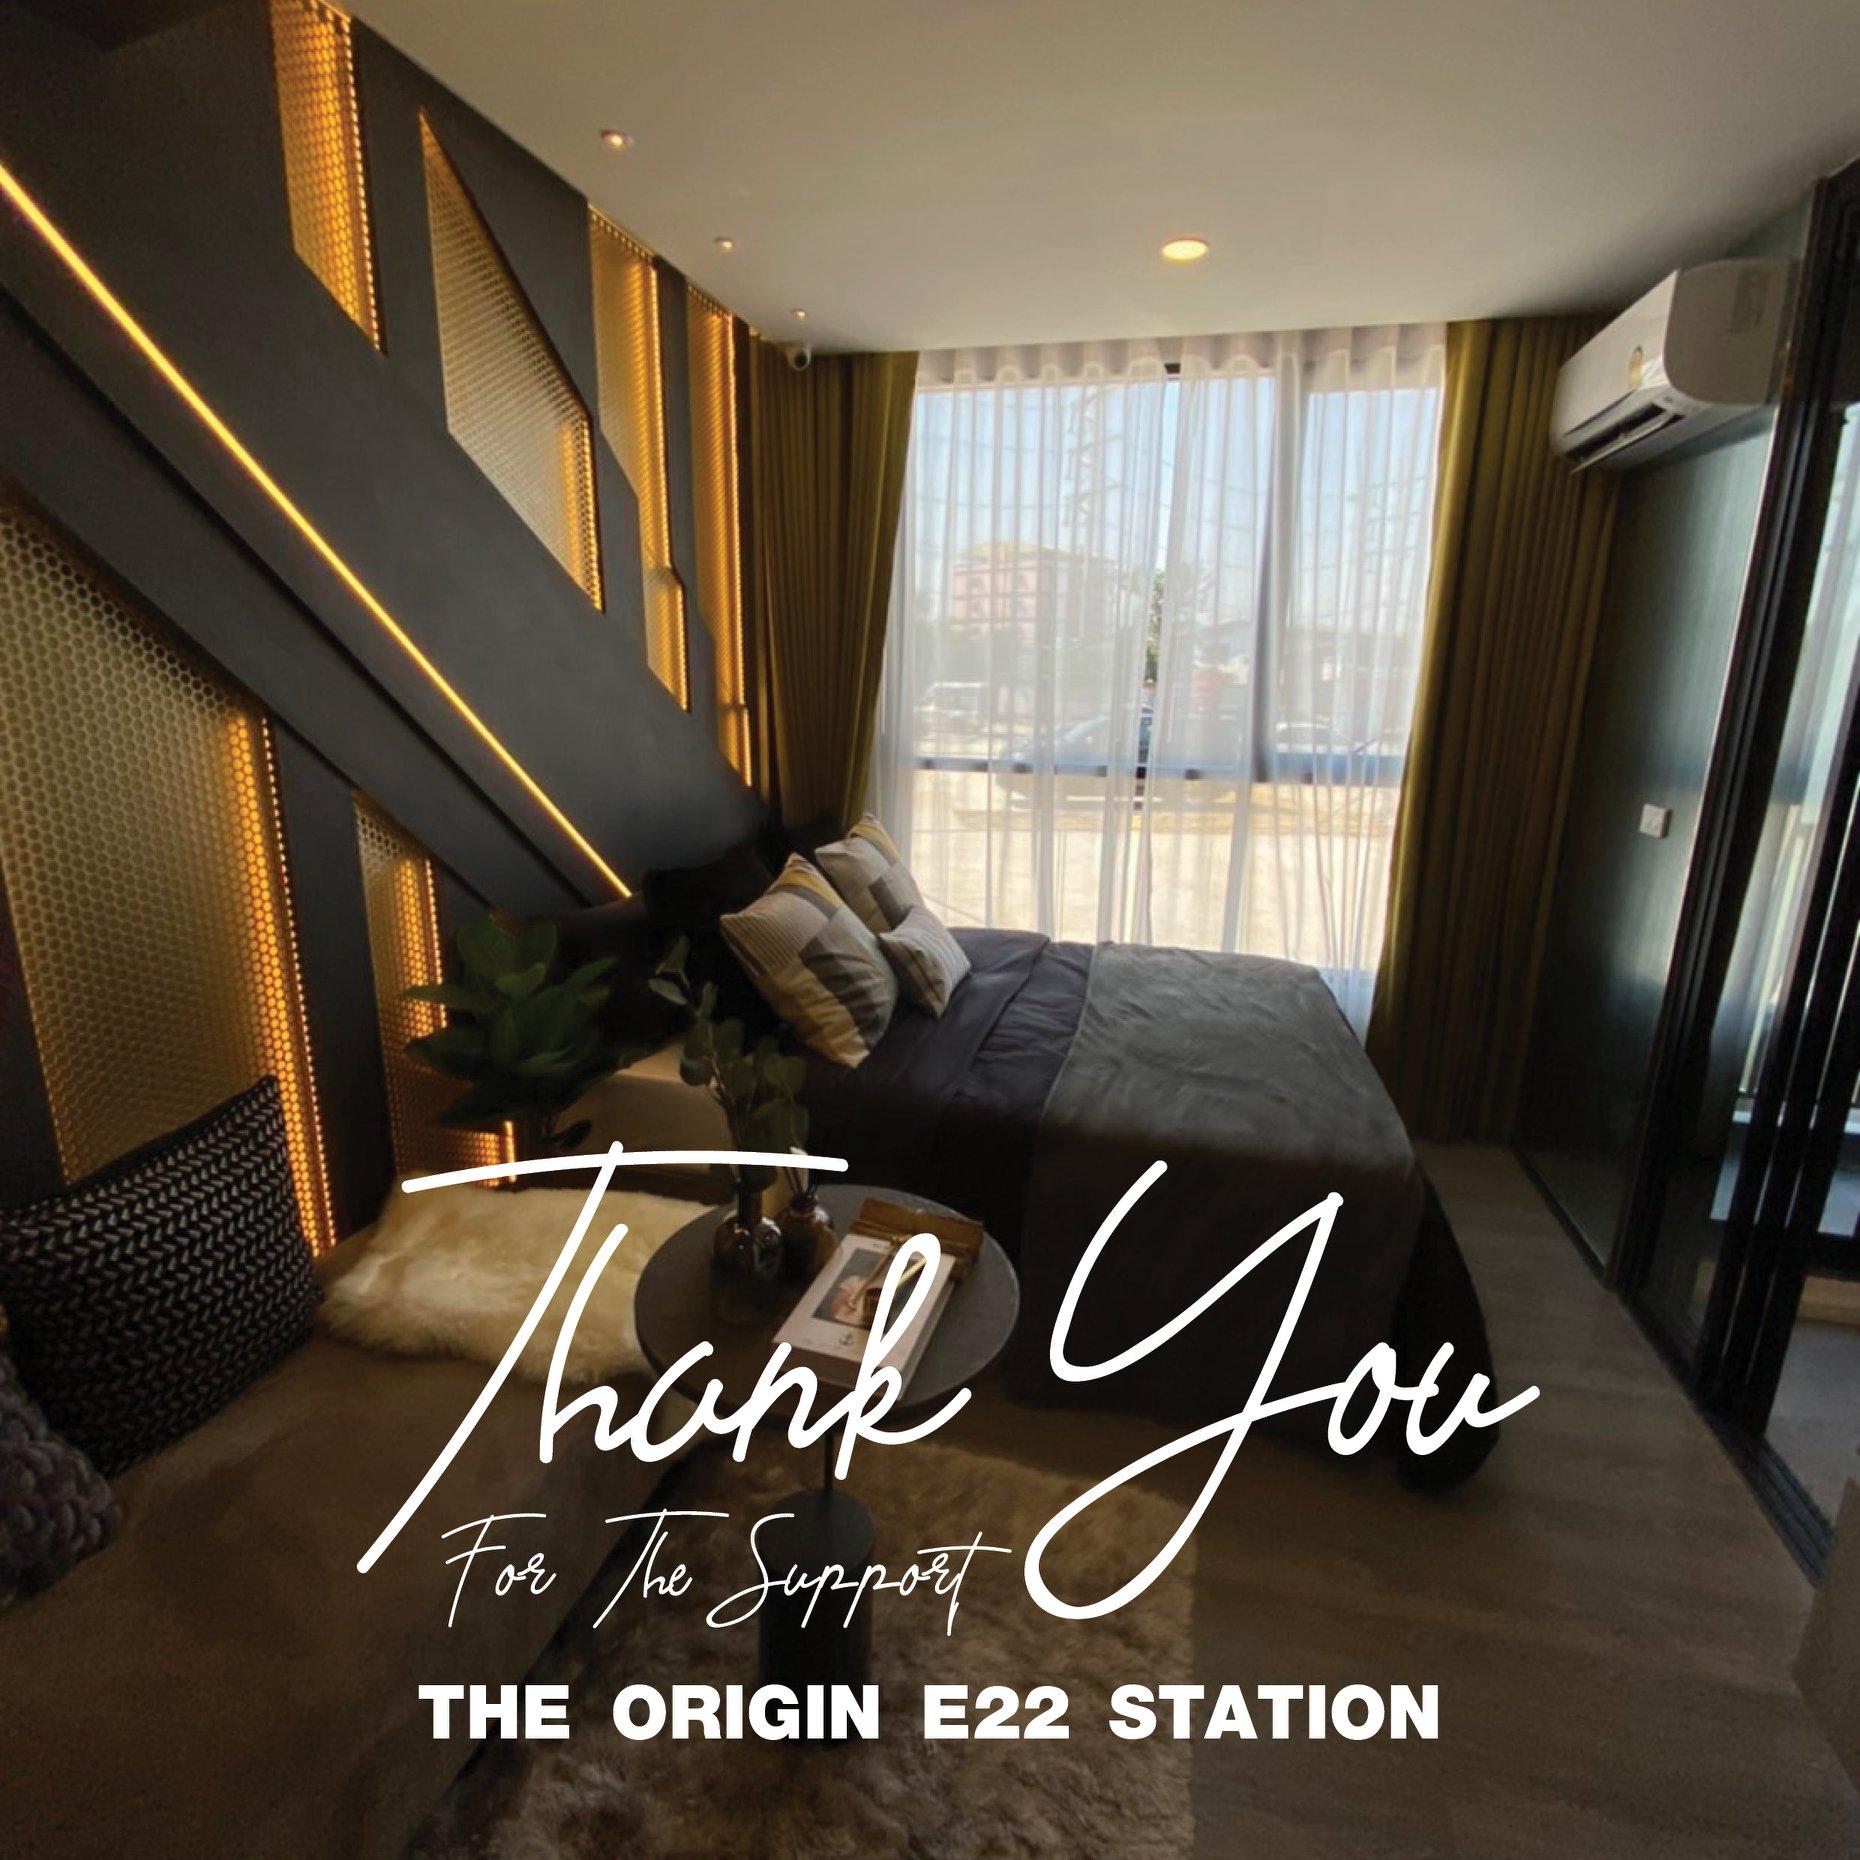 THE ORIGIN E22 STATION – VẢI NỘI THẤT NĂM 2020